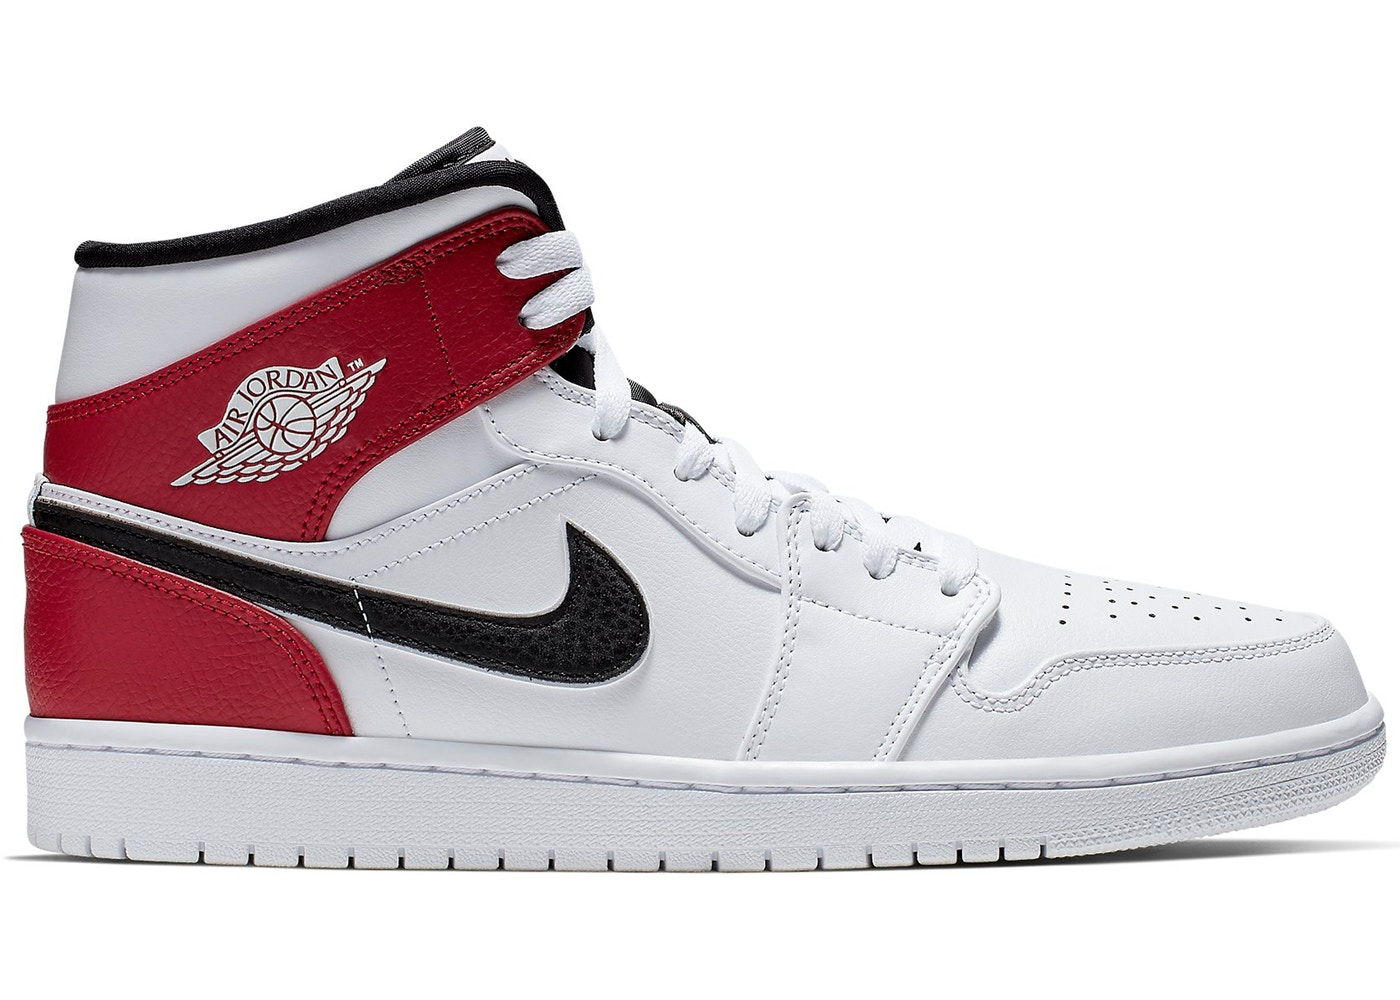 new concept a224e 46108 Jordan 1 Mid White Black Gym Red